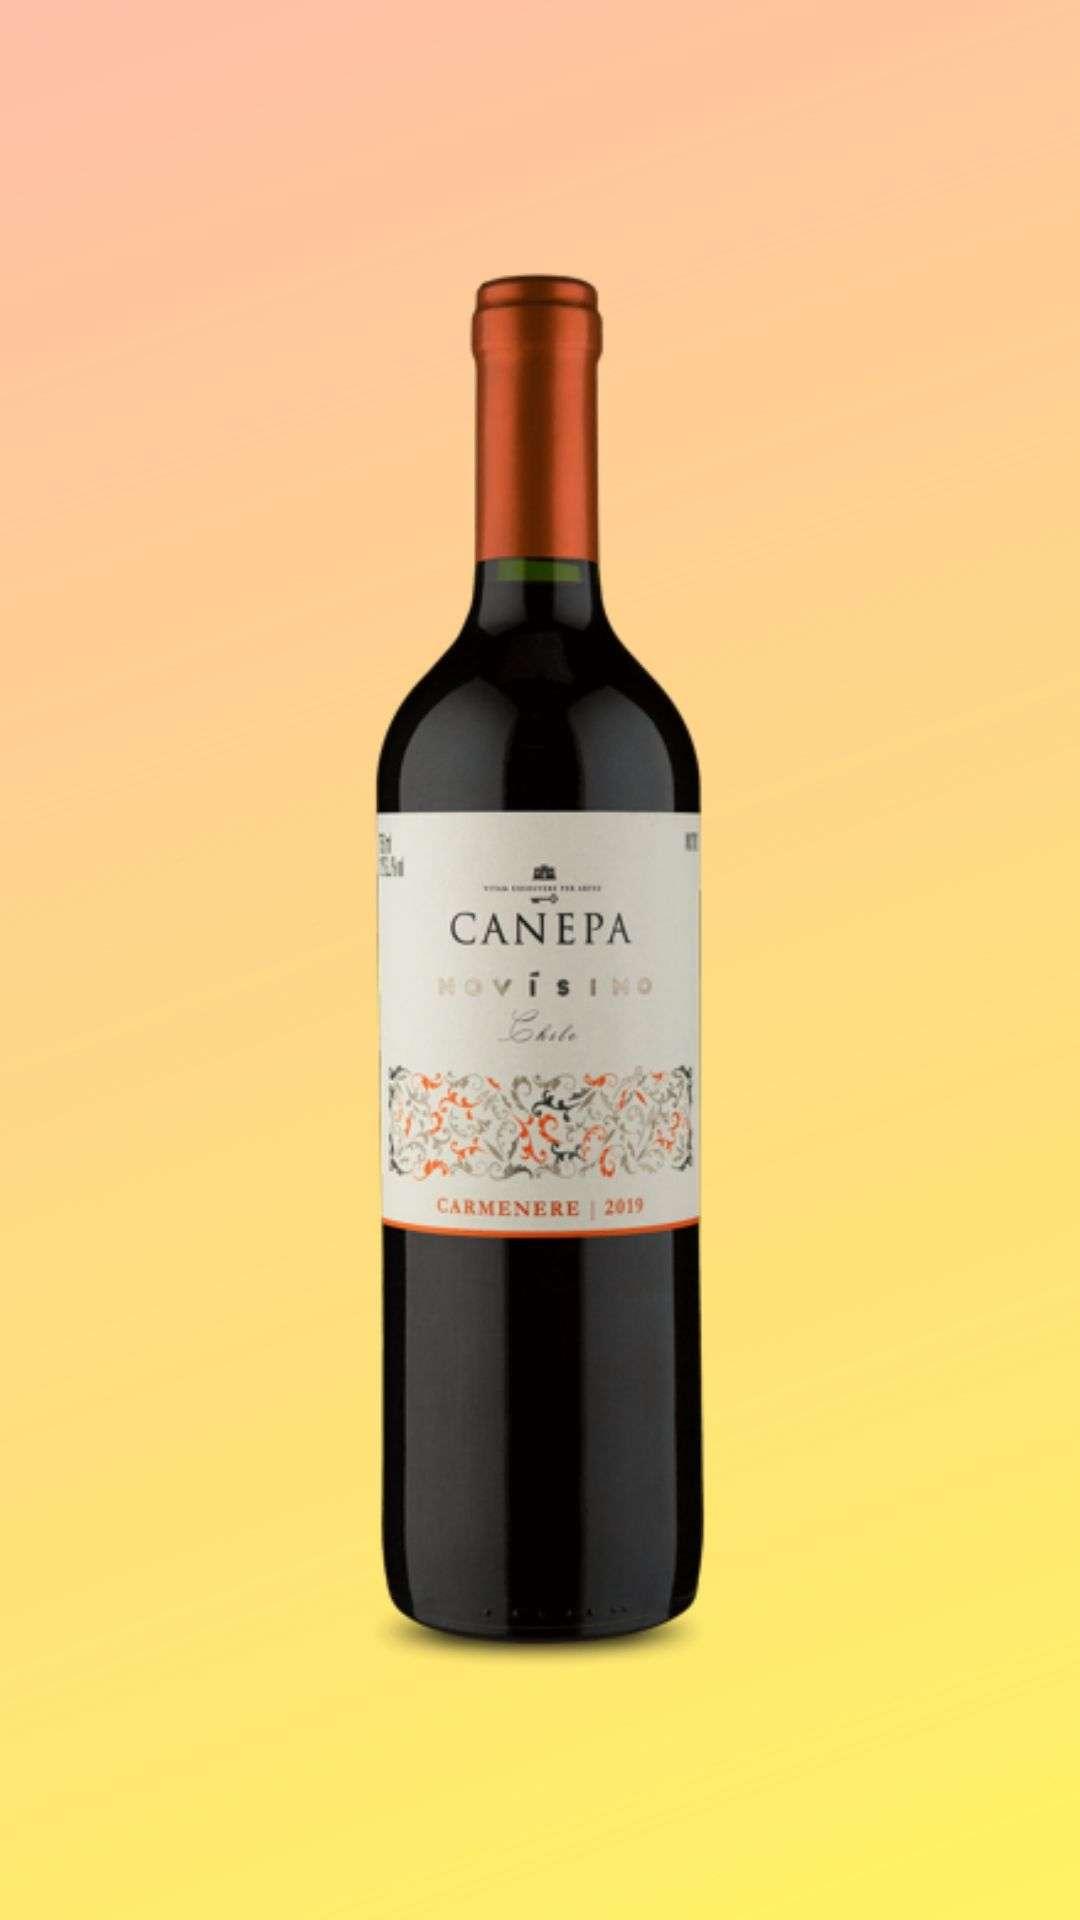 Canepa Novísimo Carménère 2019